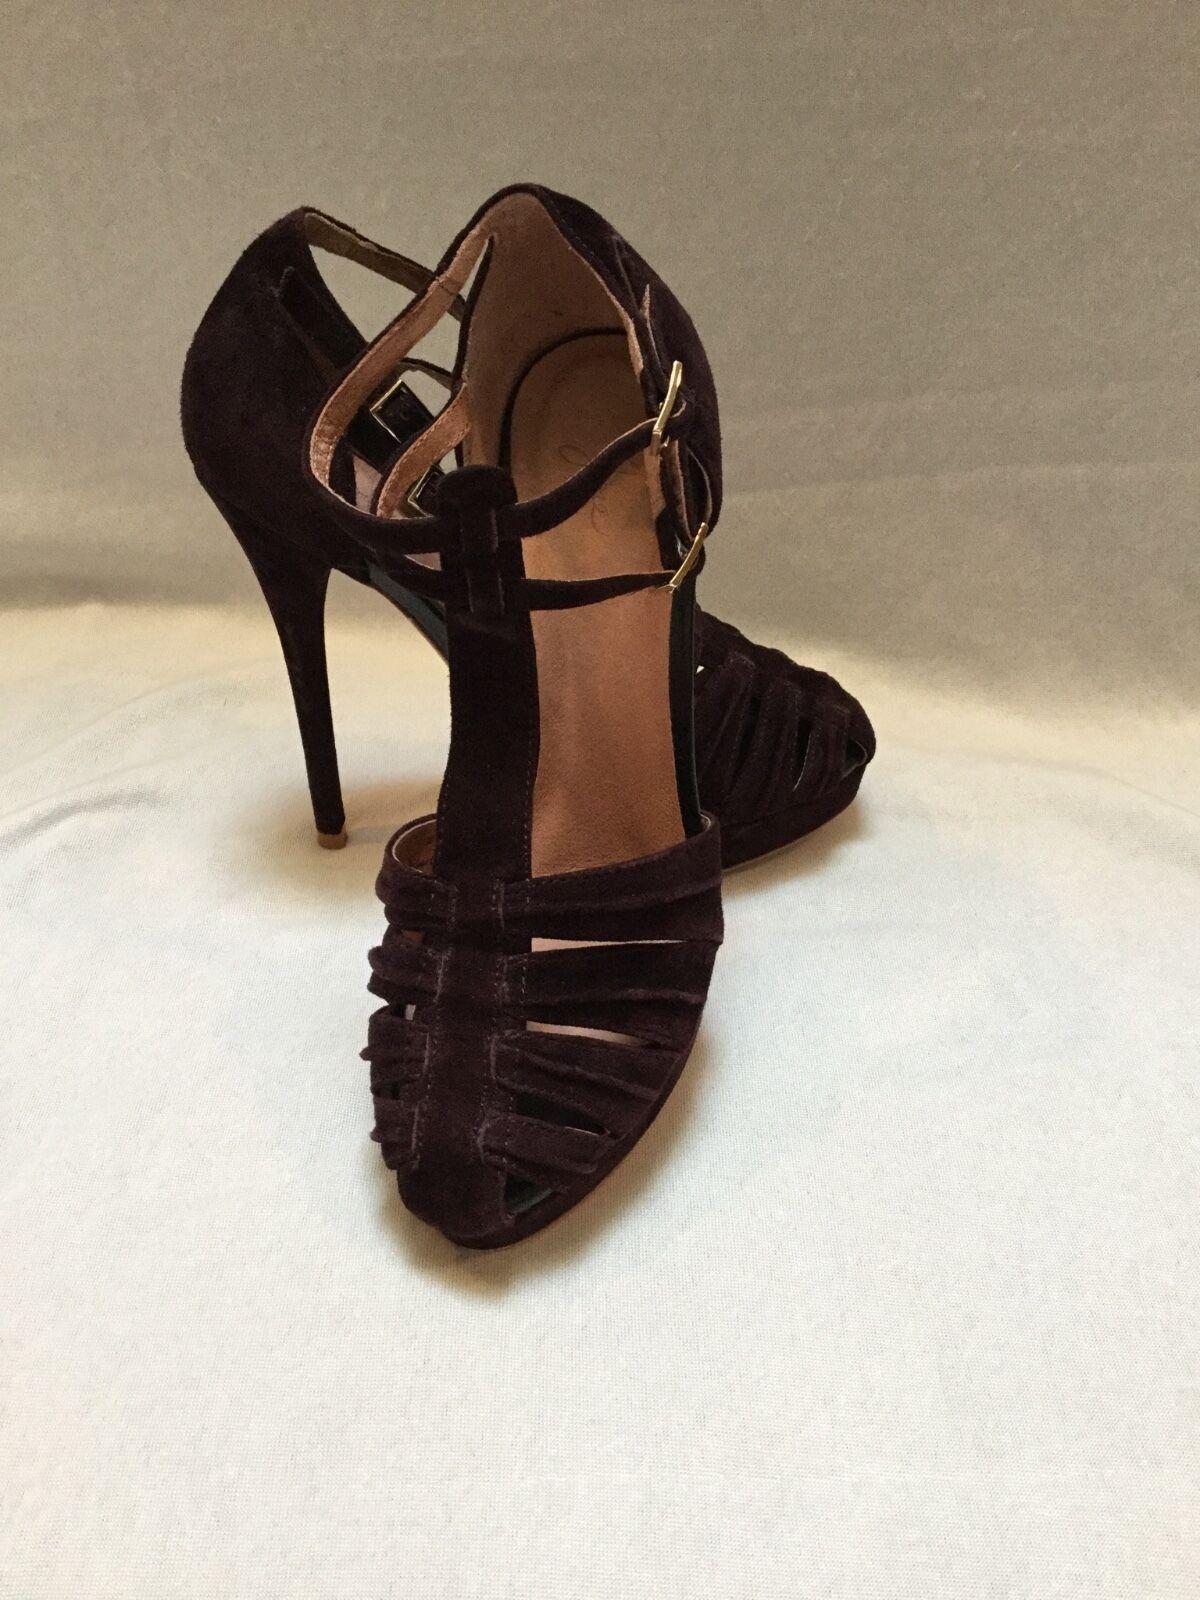 Joie - Women's Rexanne  Brown Suede Platform Sandal Heels - Size 6.5 Worn Twice